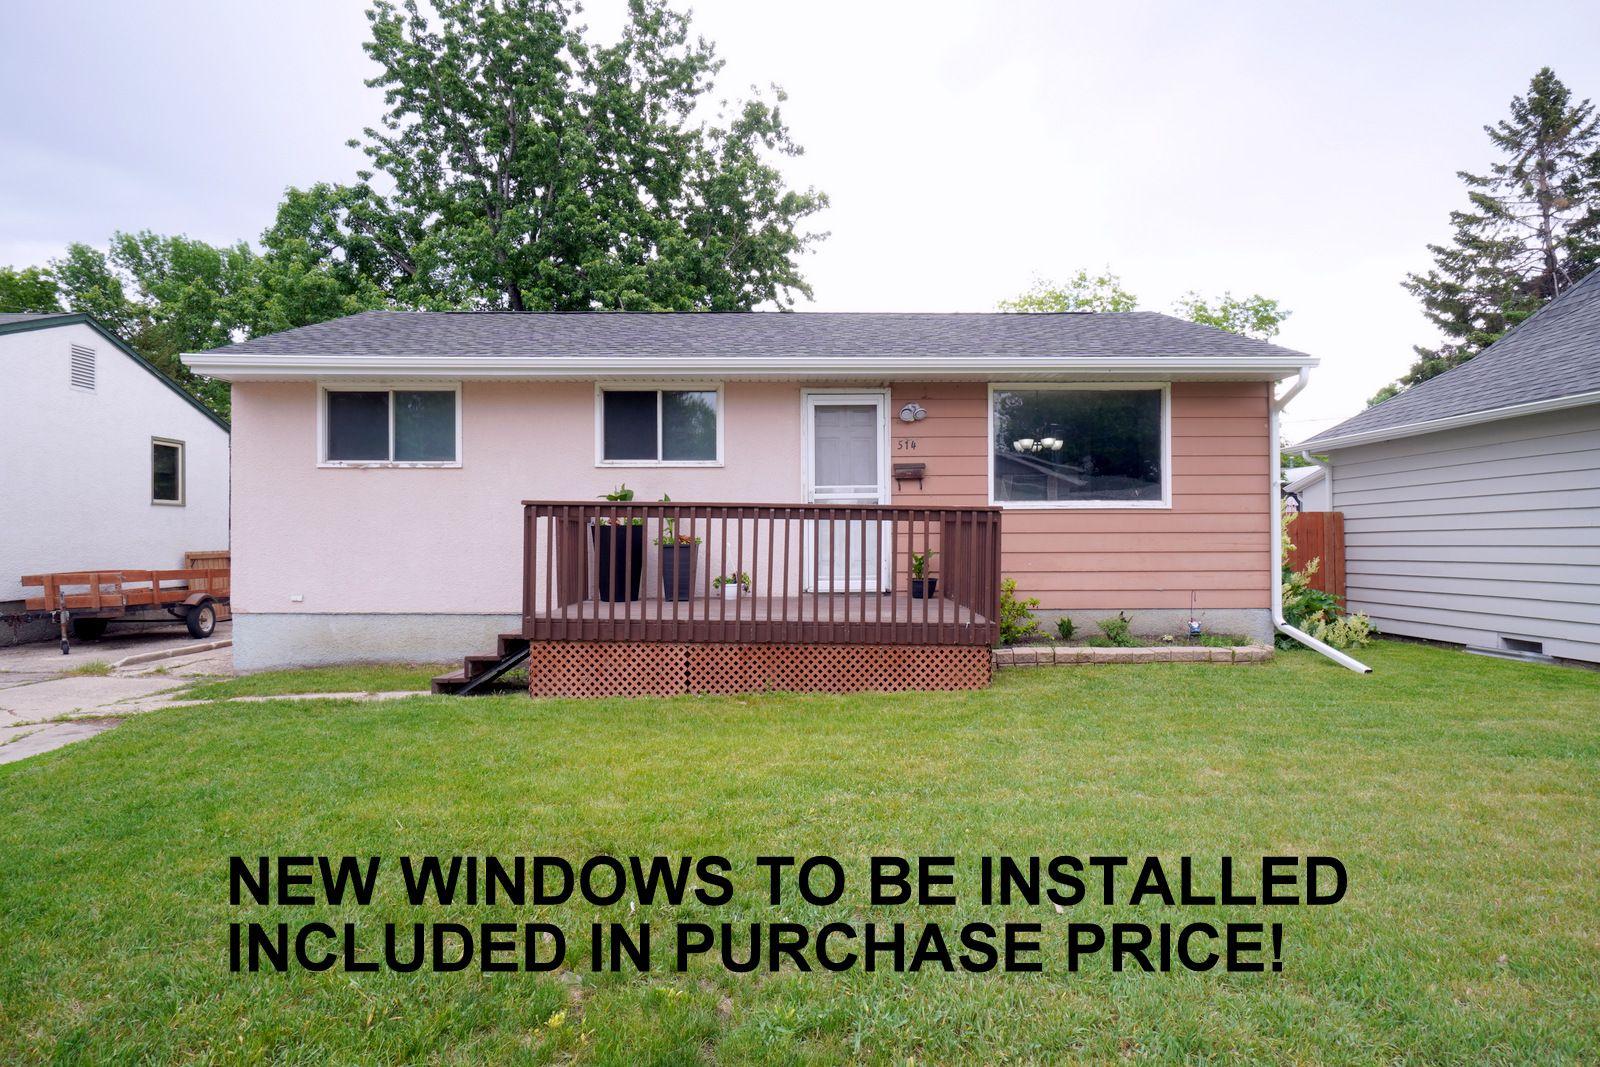 Main Photo: 514 6th Street NE in Portage la Prairie: House for sale : MLS®# 202114071